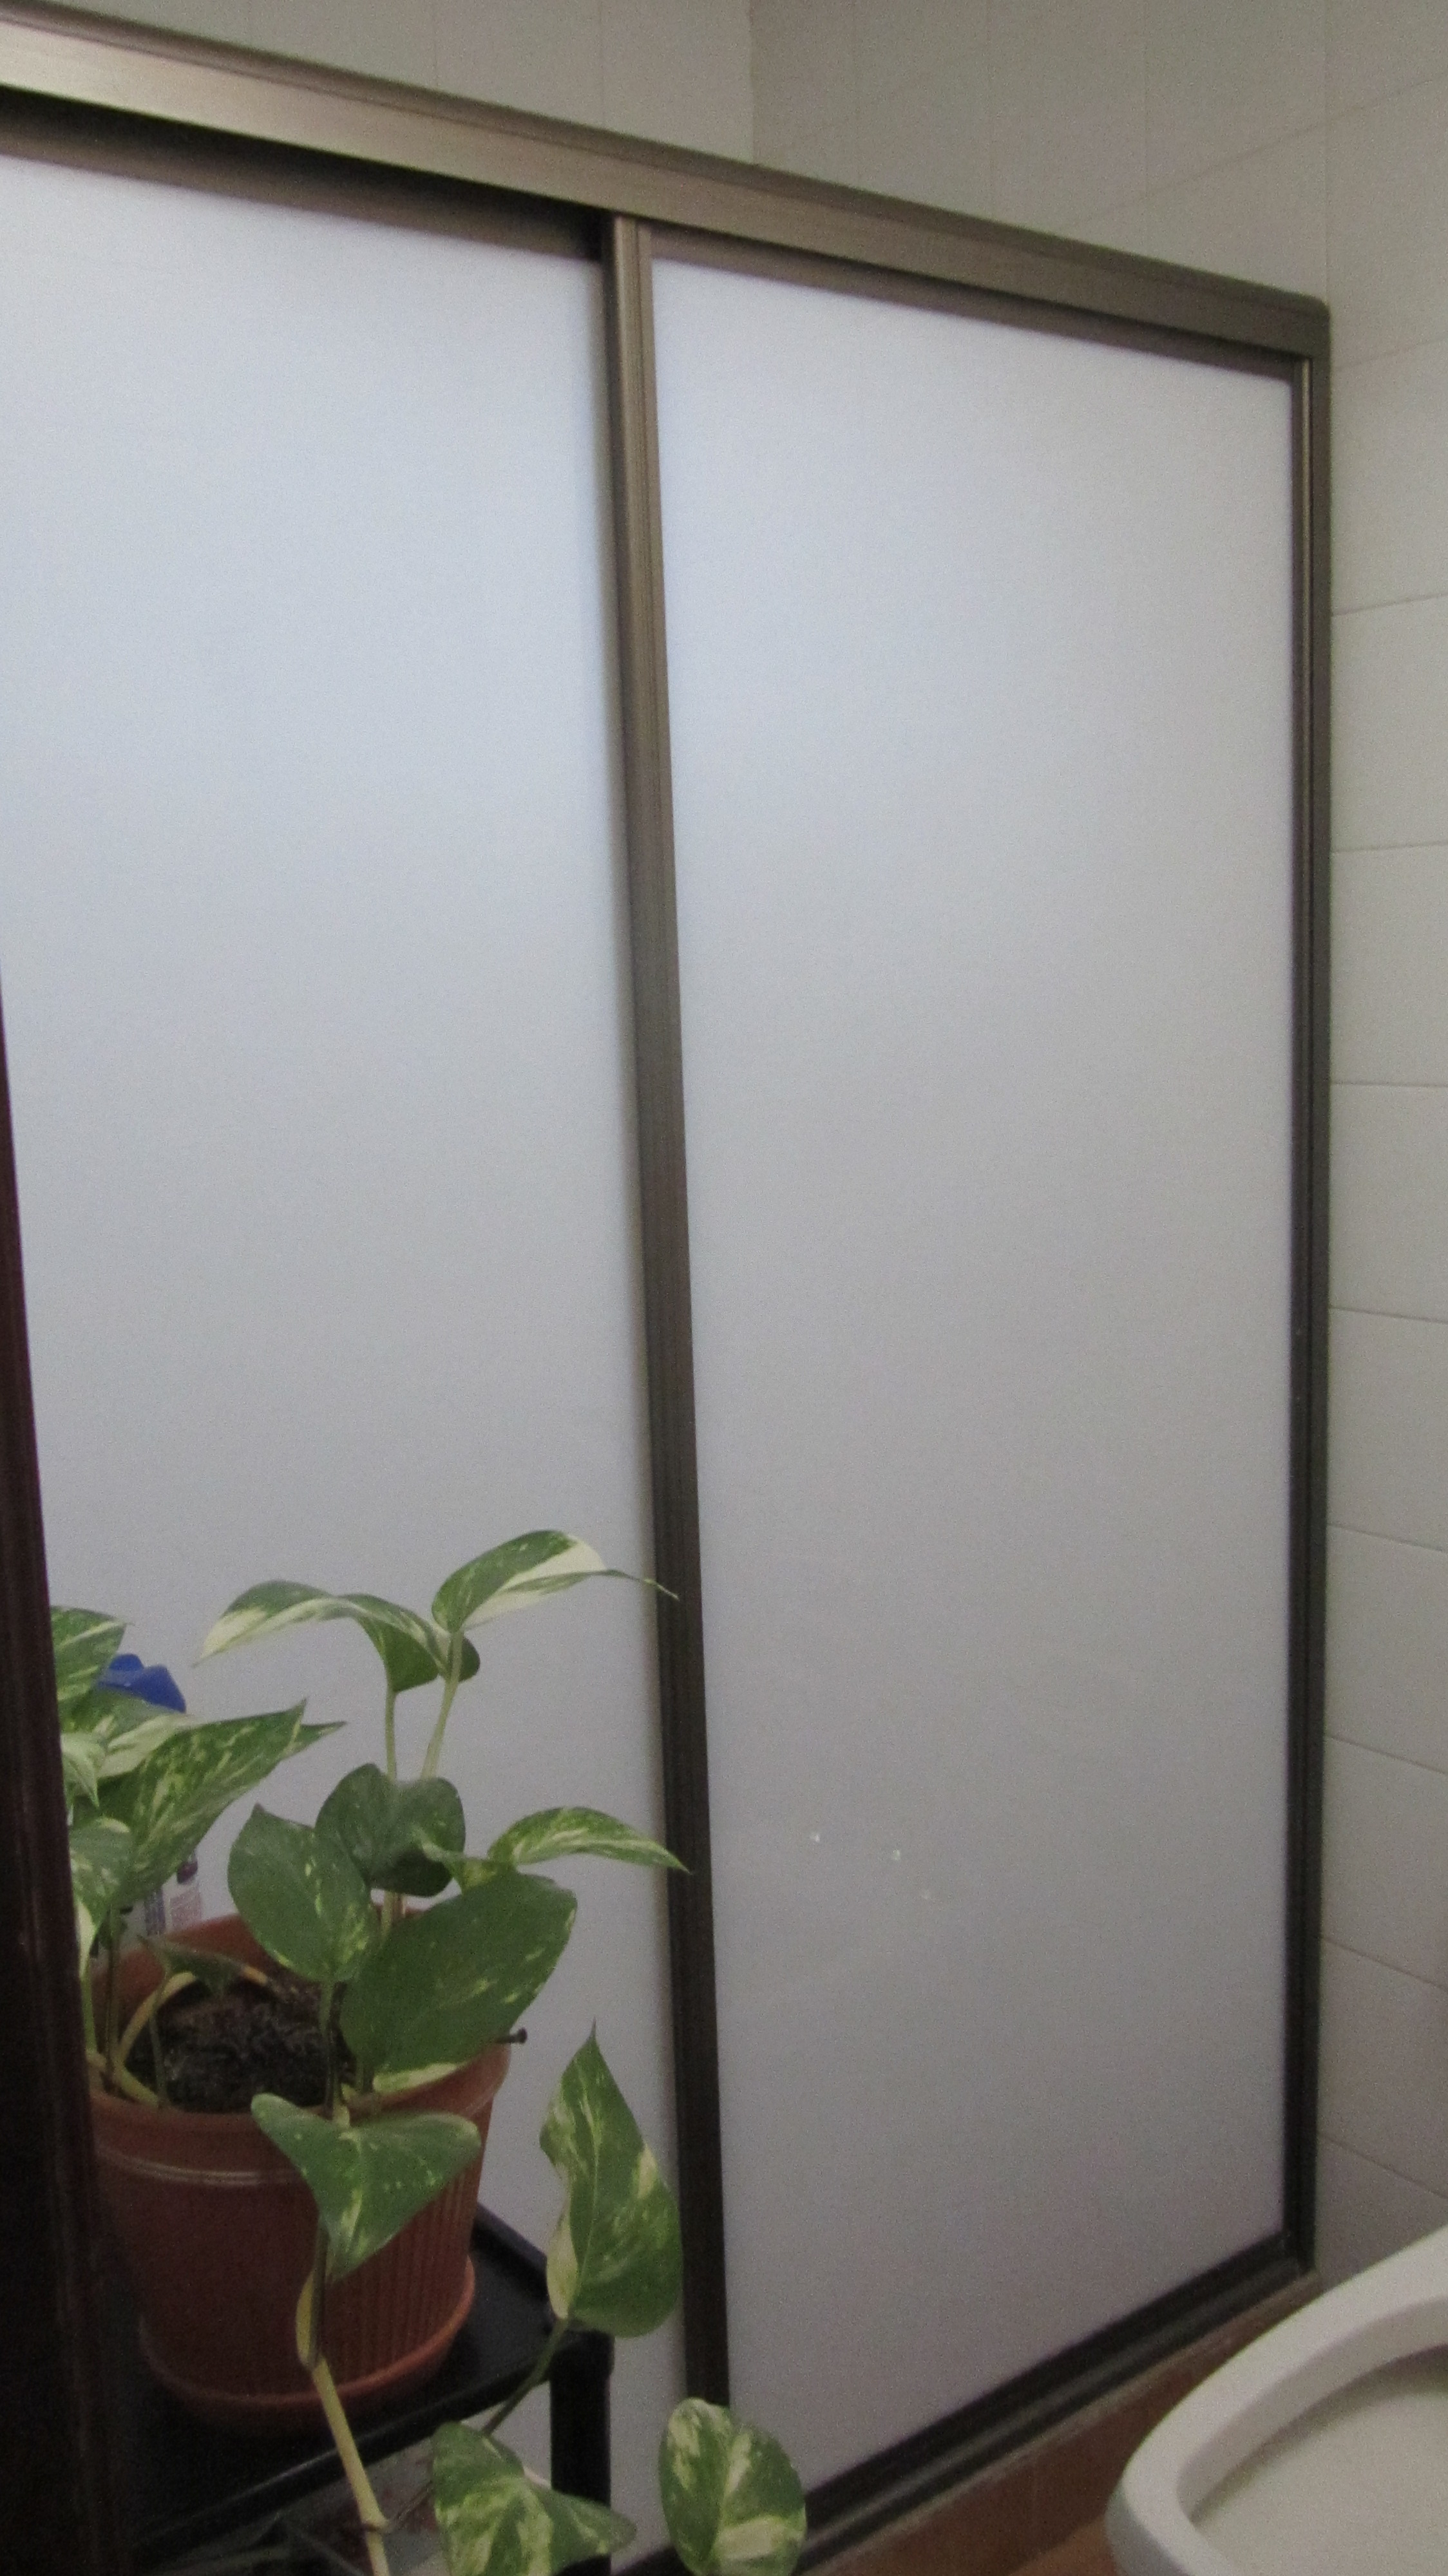 Mamparas Para Baño De Aluminio:Las mamparas para baño son la solución ideal para lograr seguridad